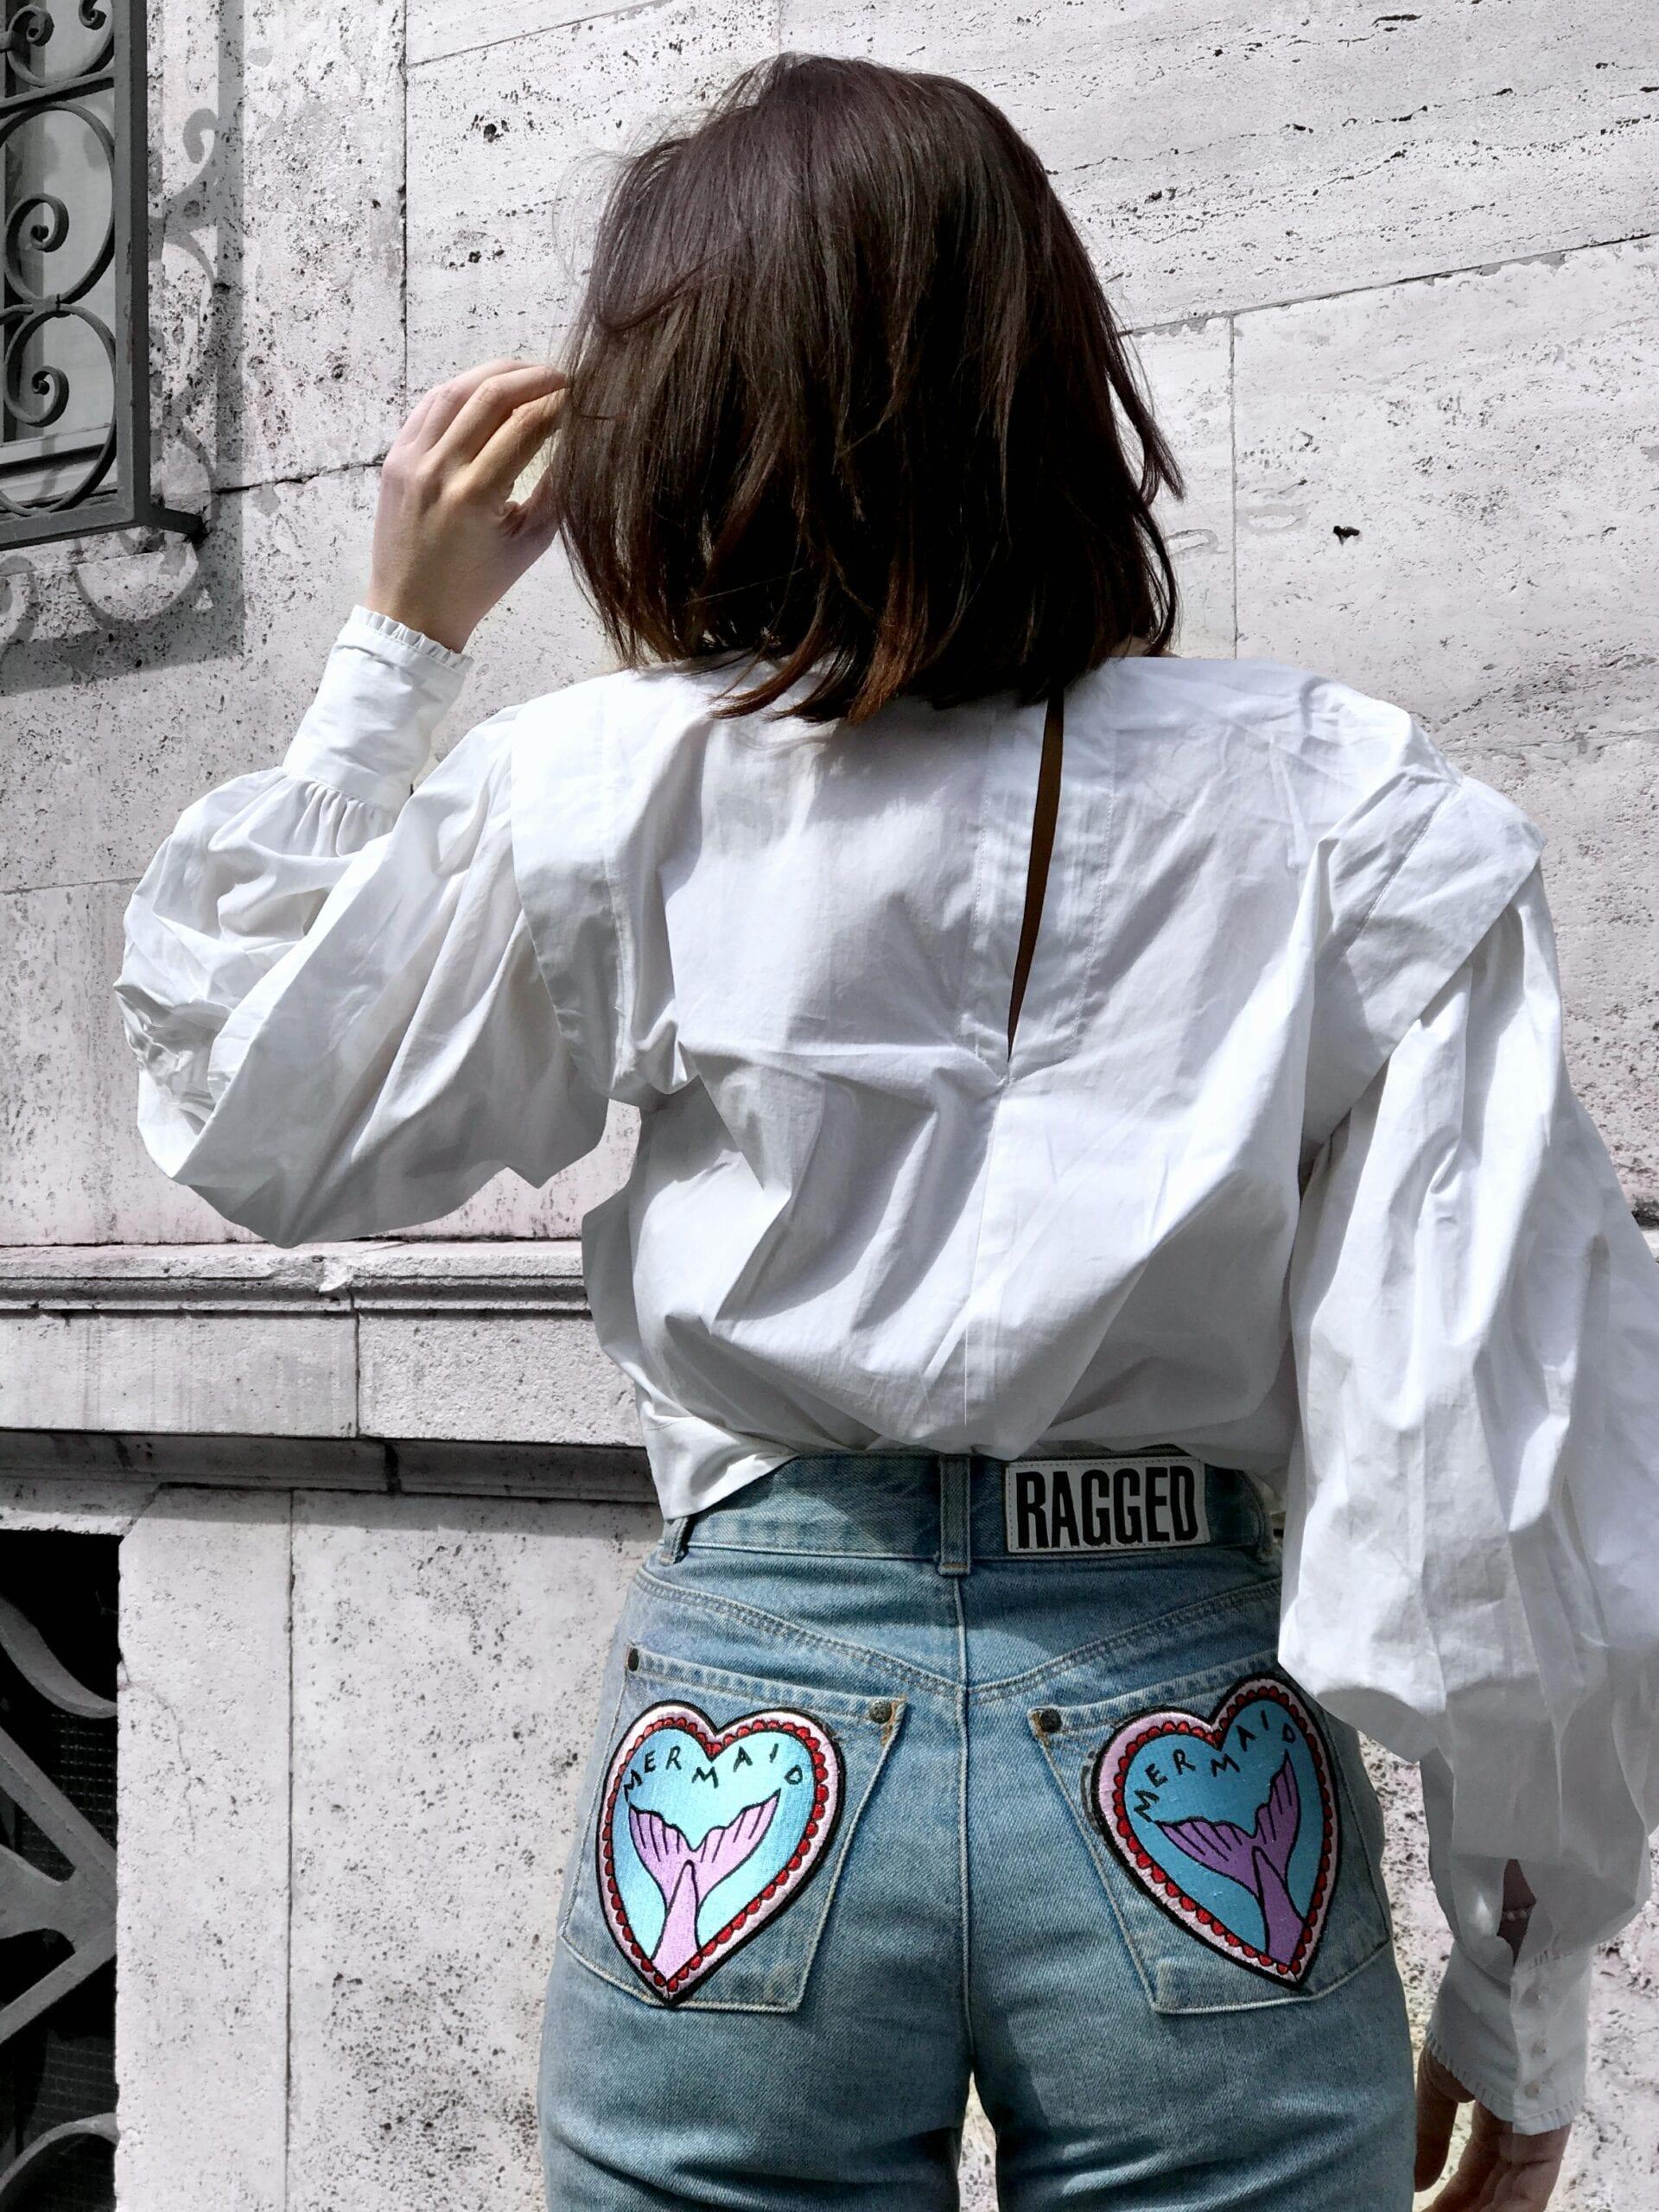 Jeans femminili più belli, theladycracy.it, elisa bellino, fashion blog, fashion blogger italiane 2017, fashion blogger famose 2017, blogger moda 2017, blog moda 2017, blogger moda italiane 2017, blogger moda più seguite 2017, jeans zara, jeans mango, che jeans comprare,